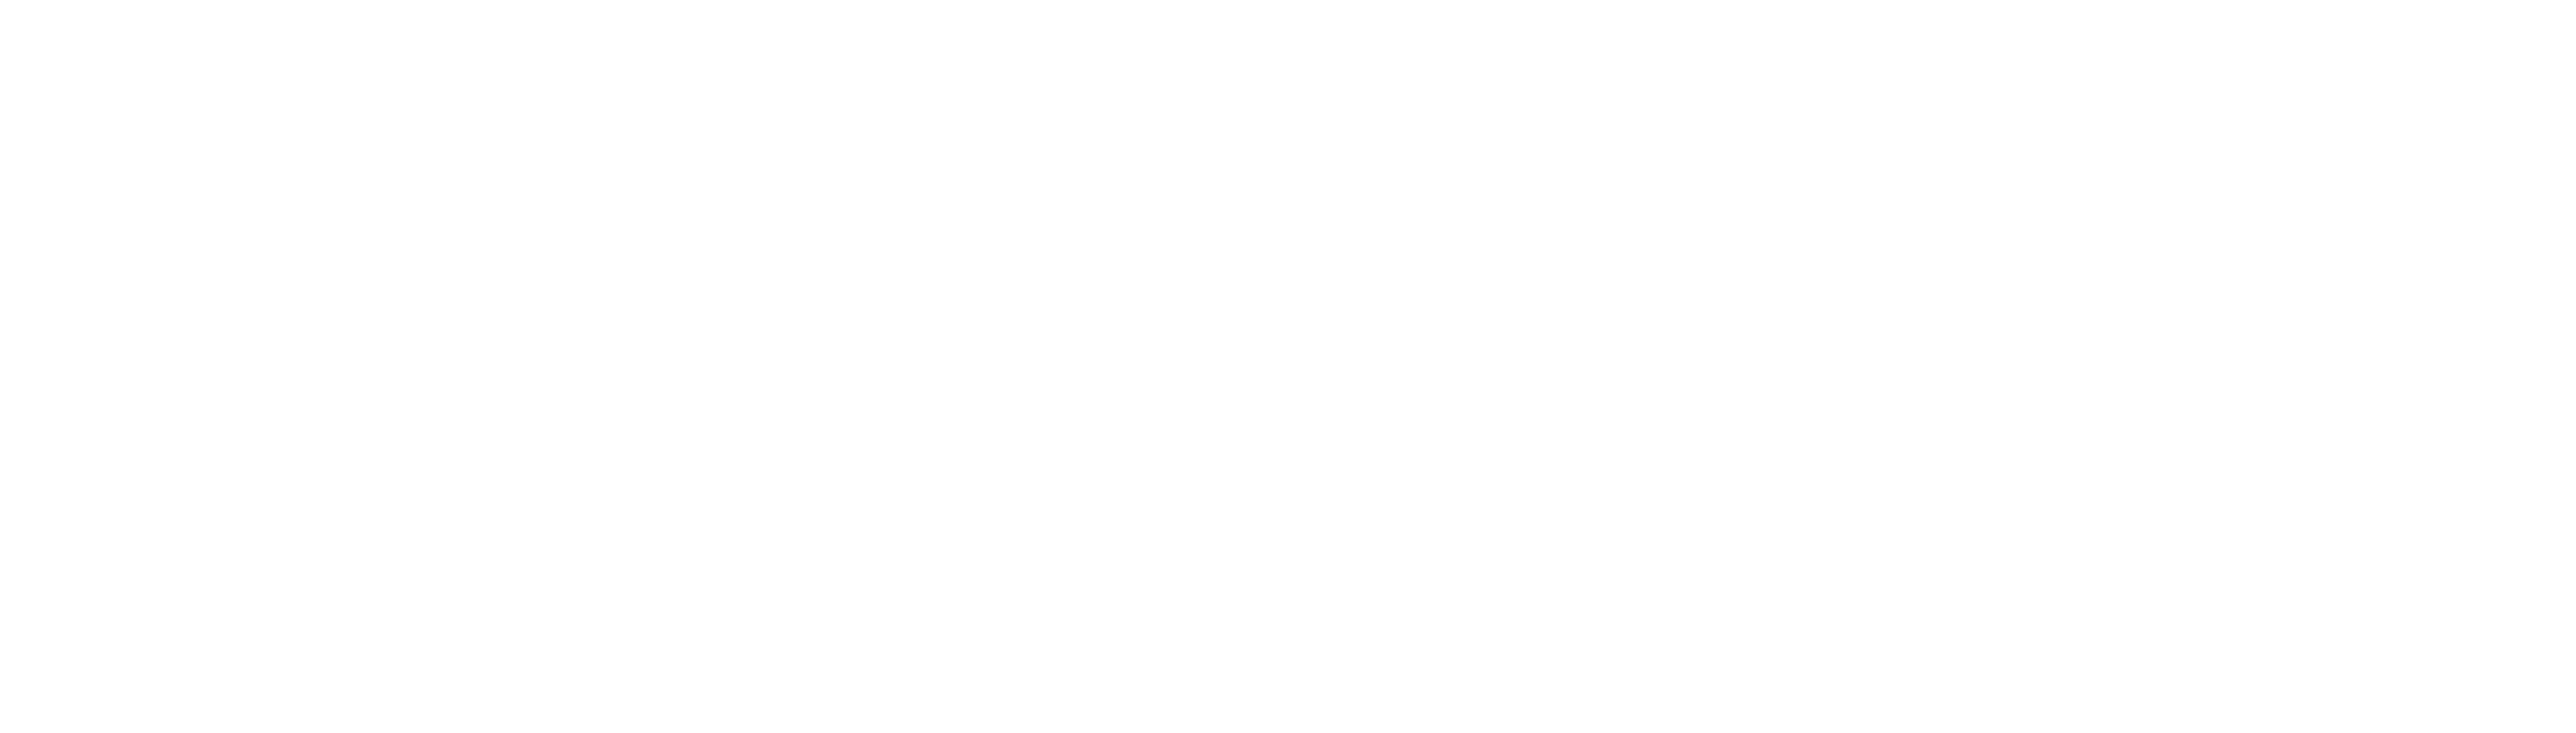 Elite ib tutors revision. English clipart tutoring